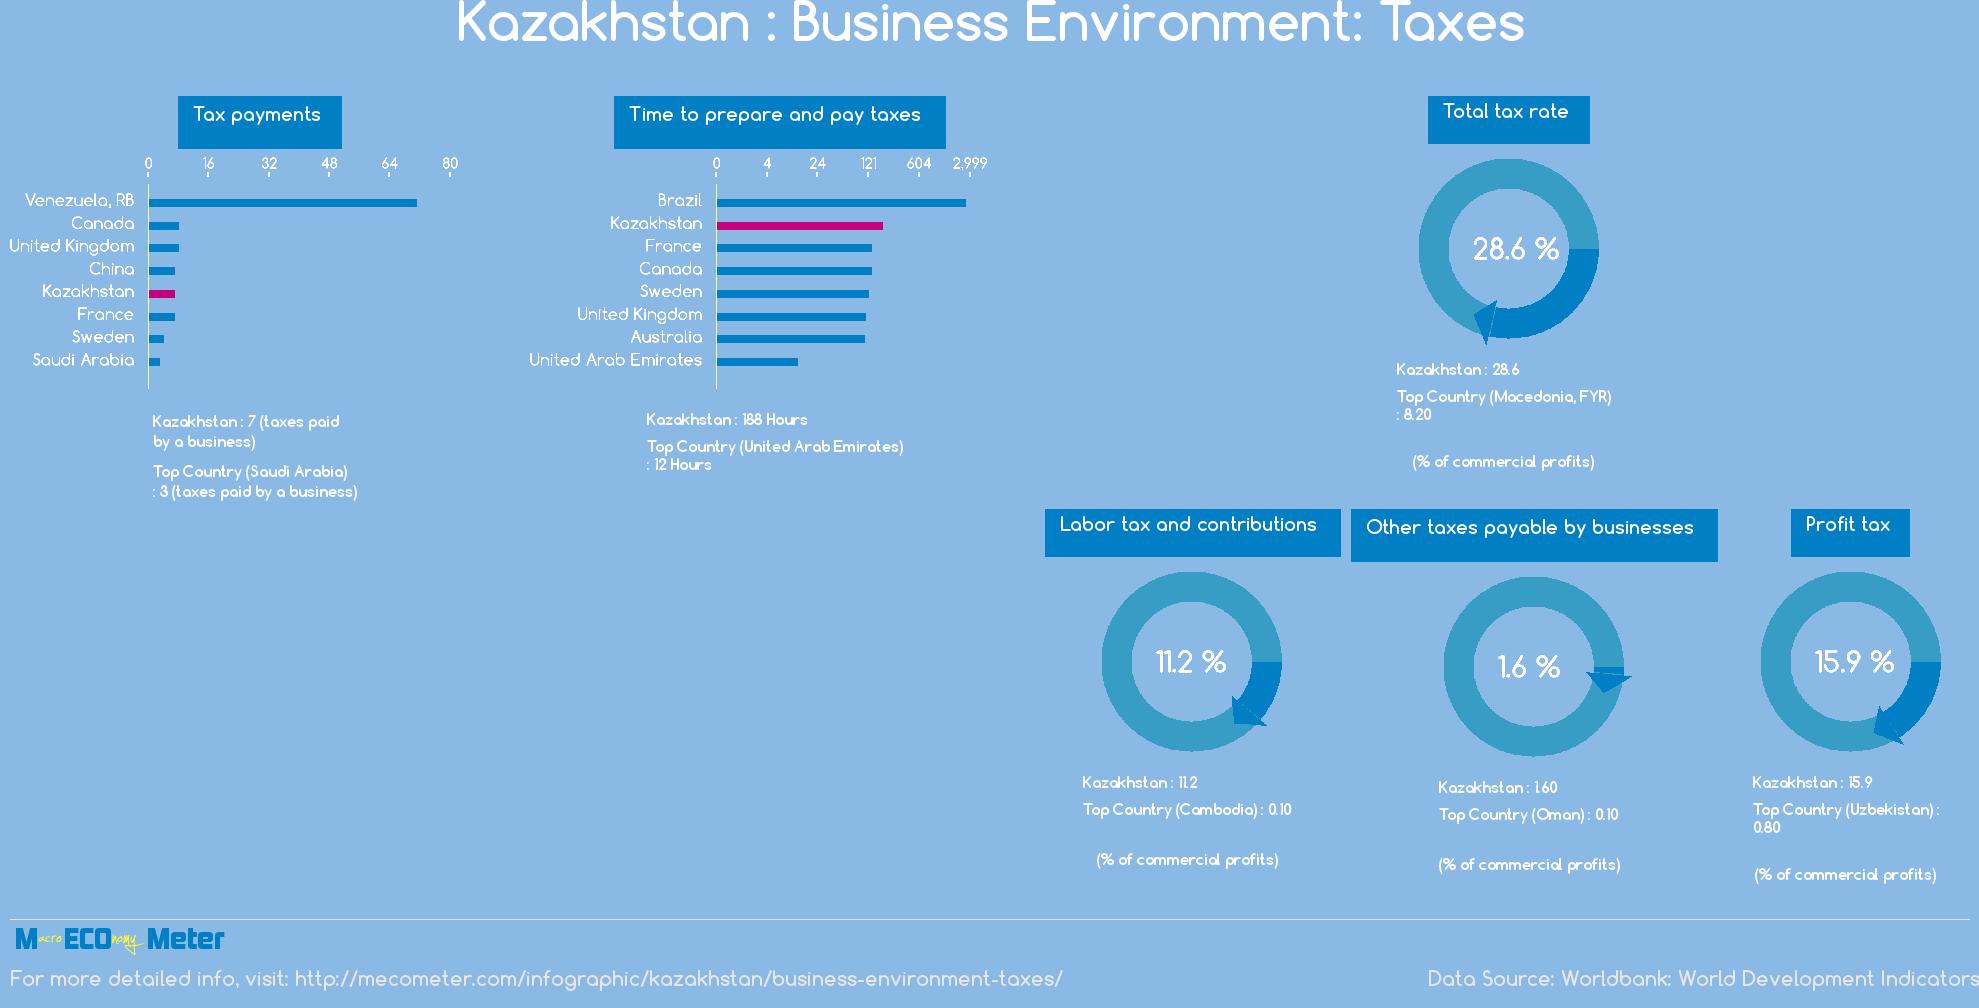 Kazakhstan : Business Environment: Taxes